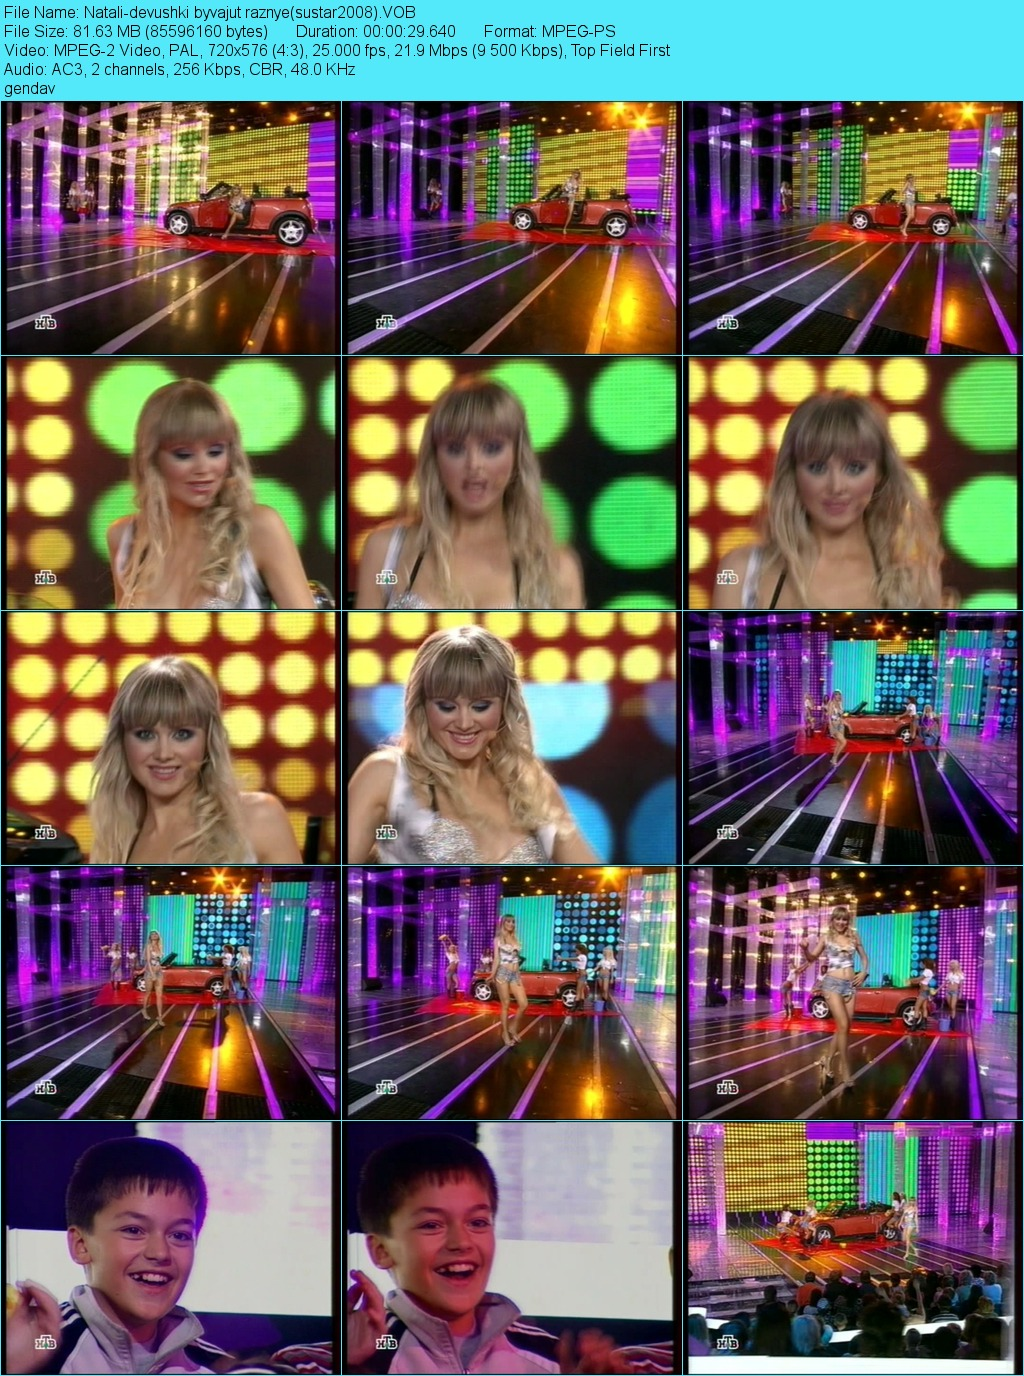 http://4put.ru/pictures/max/688/2114064.jpg